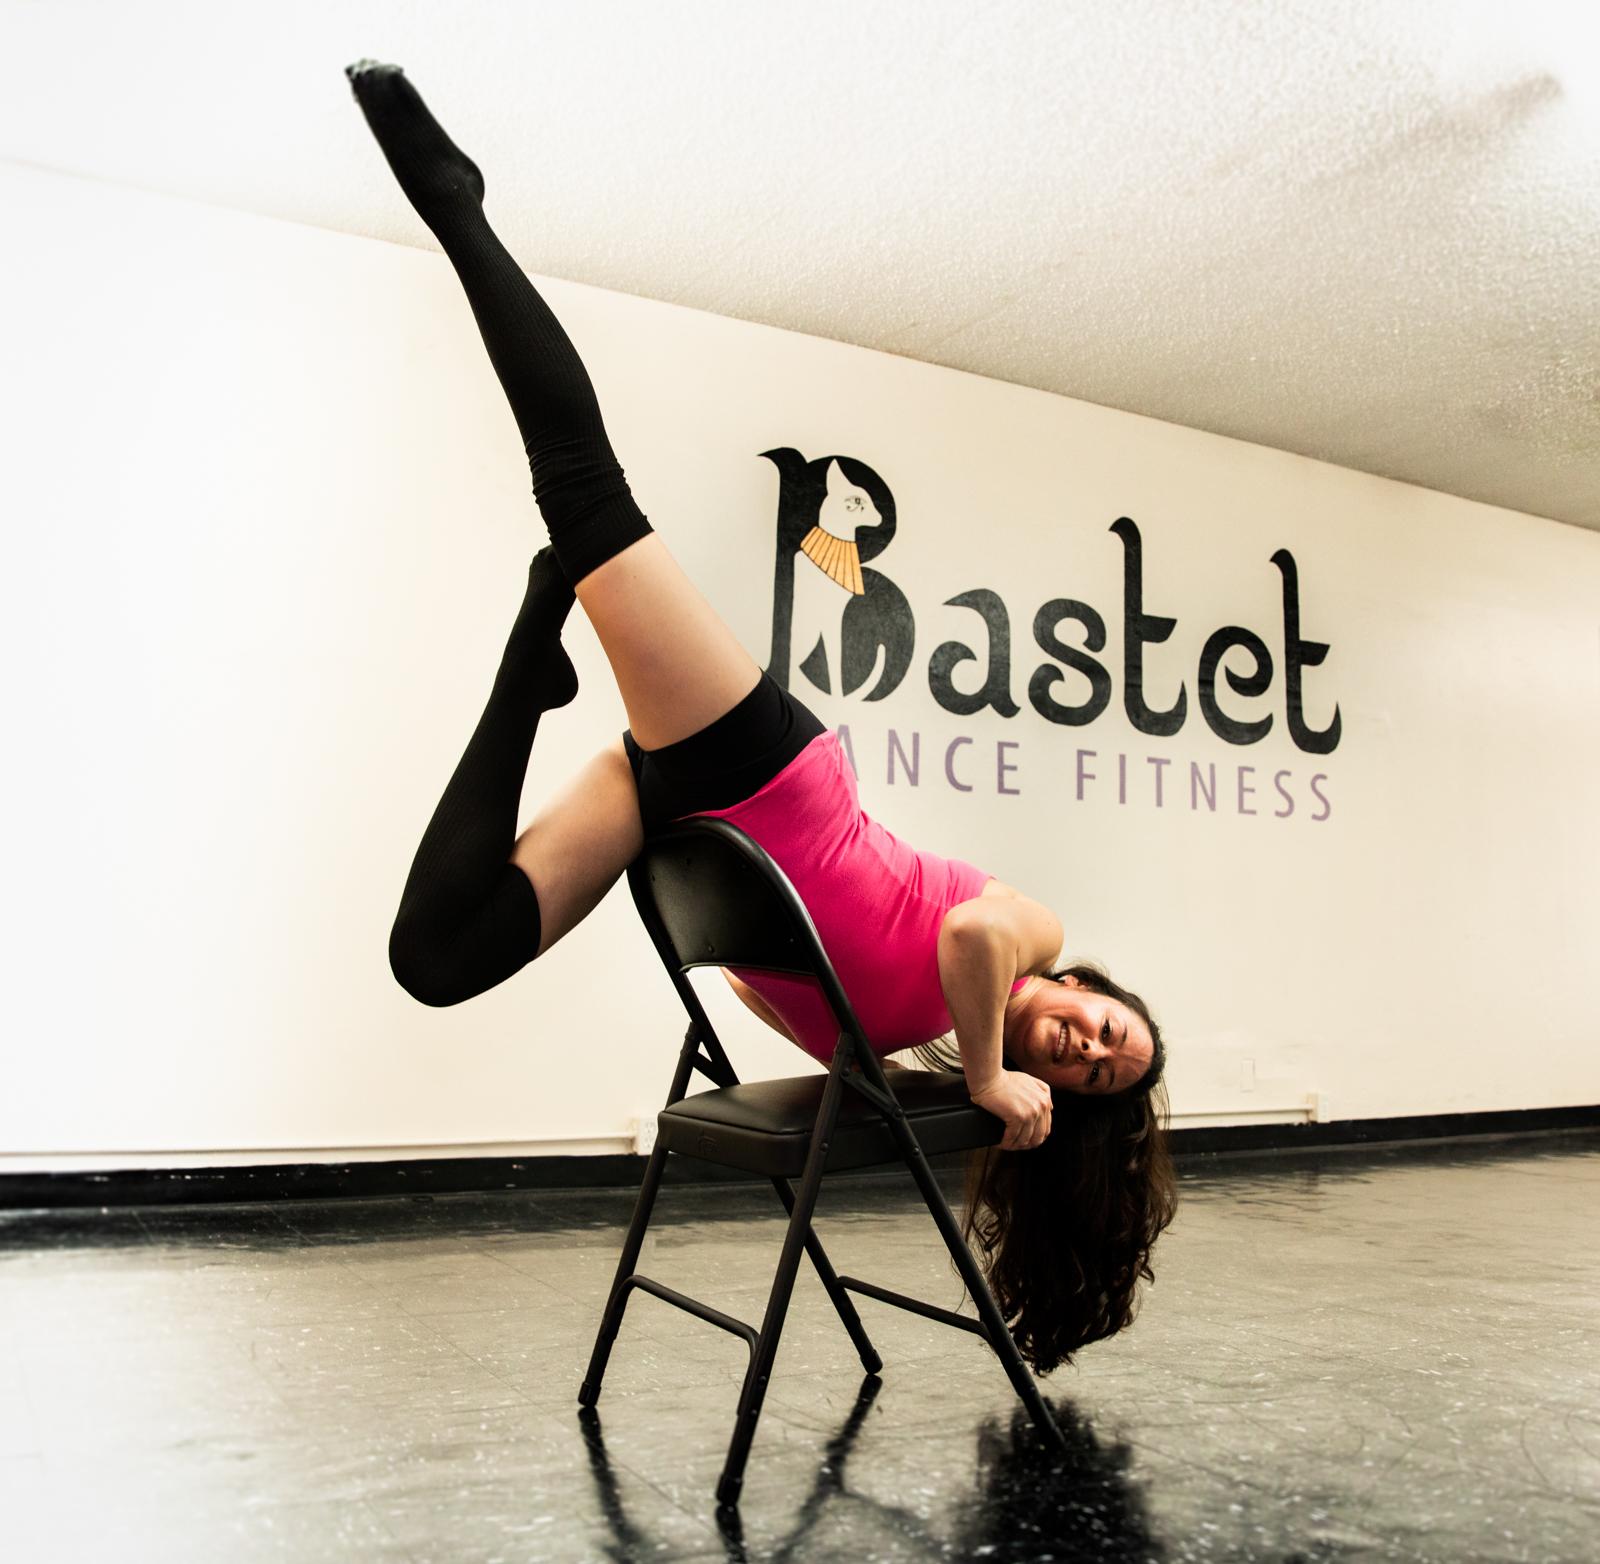 on chair dance pier 1 swing specialty class 7 8 bastet fitness